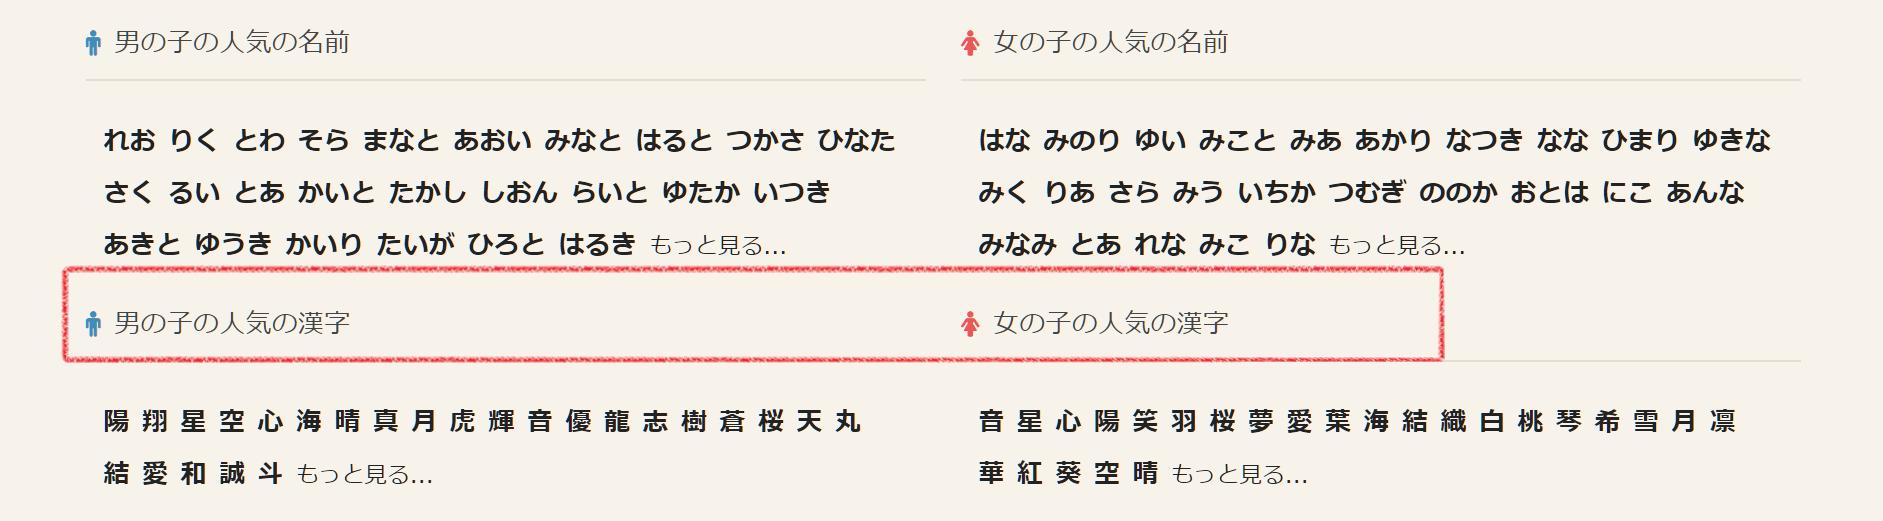 namedictionary popular kanji